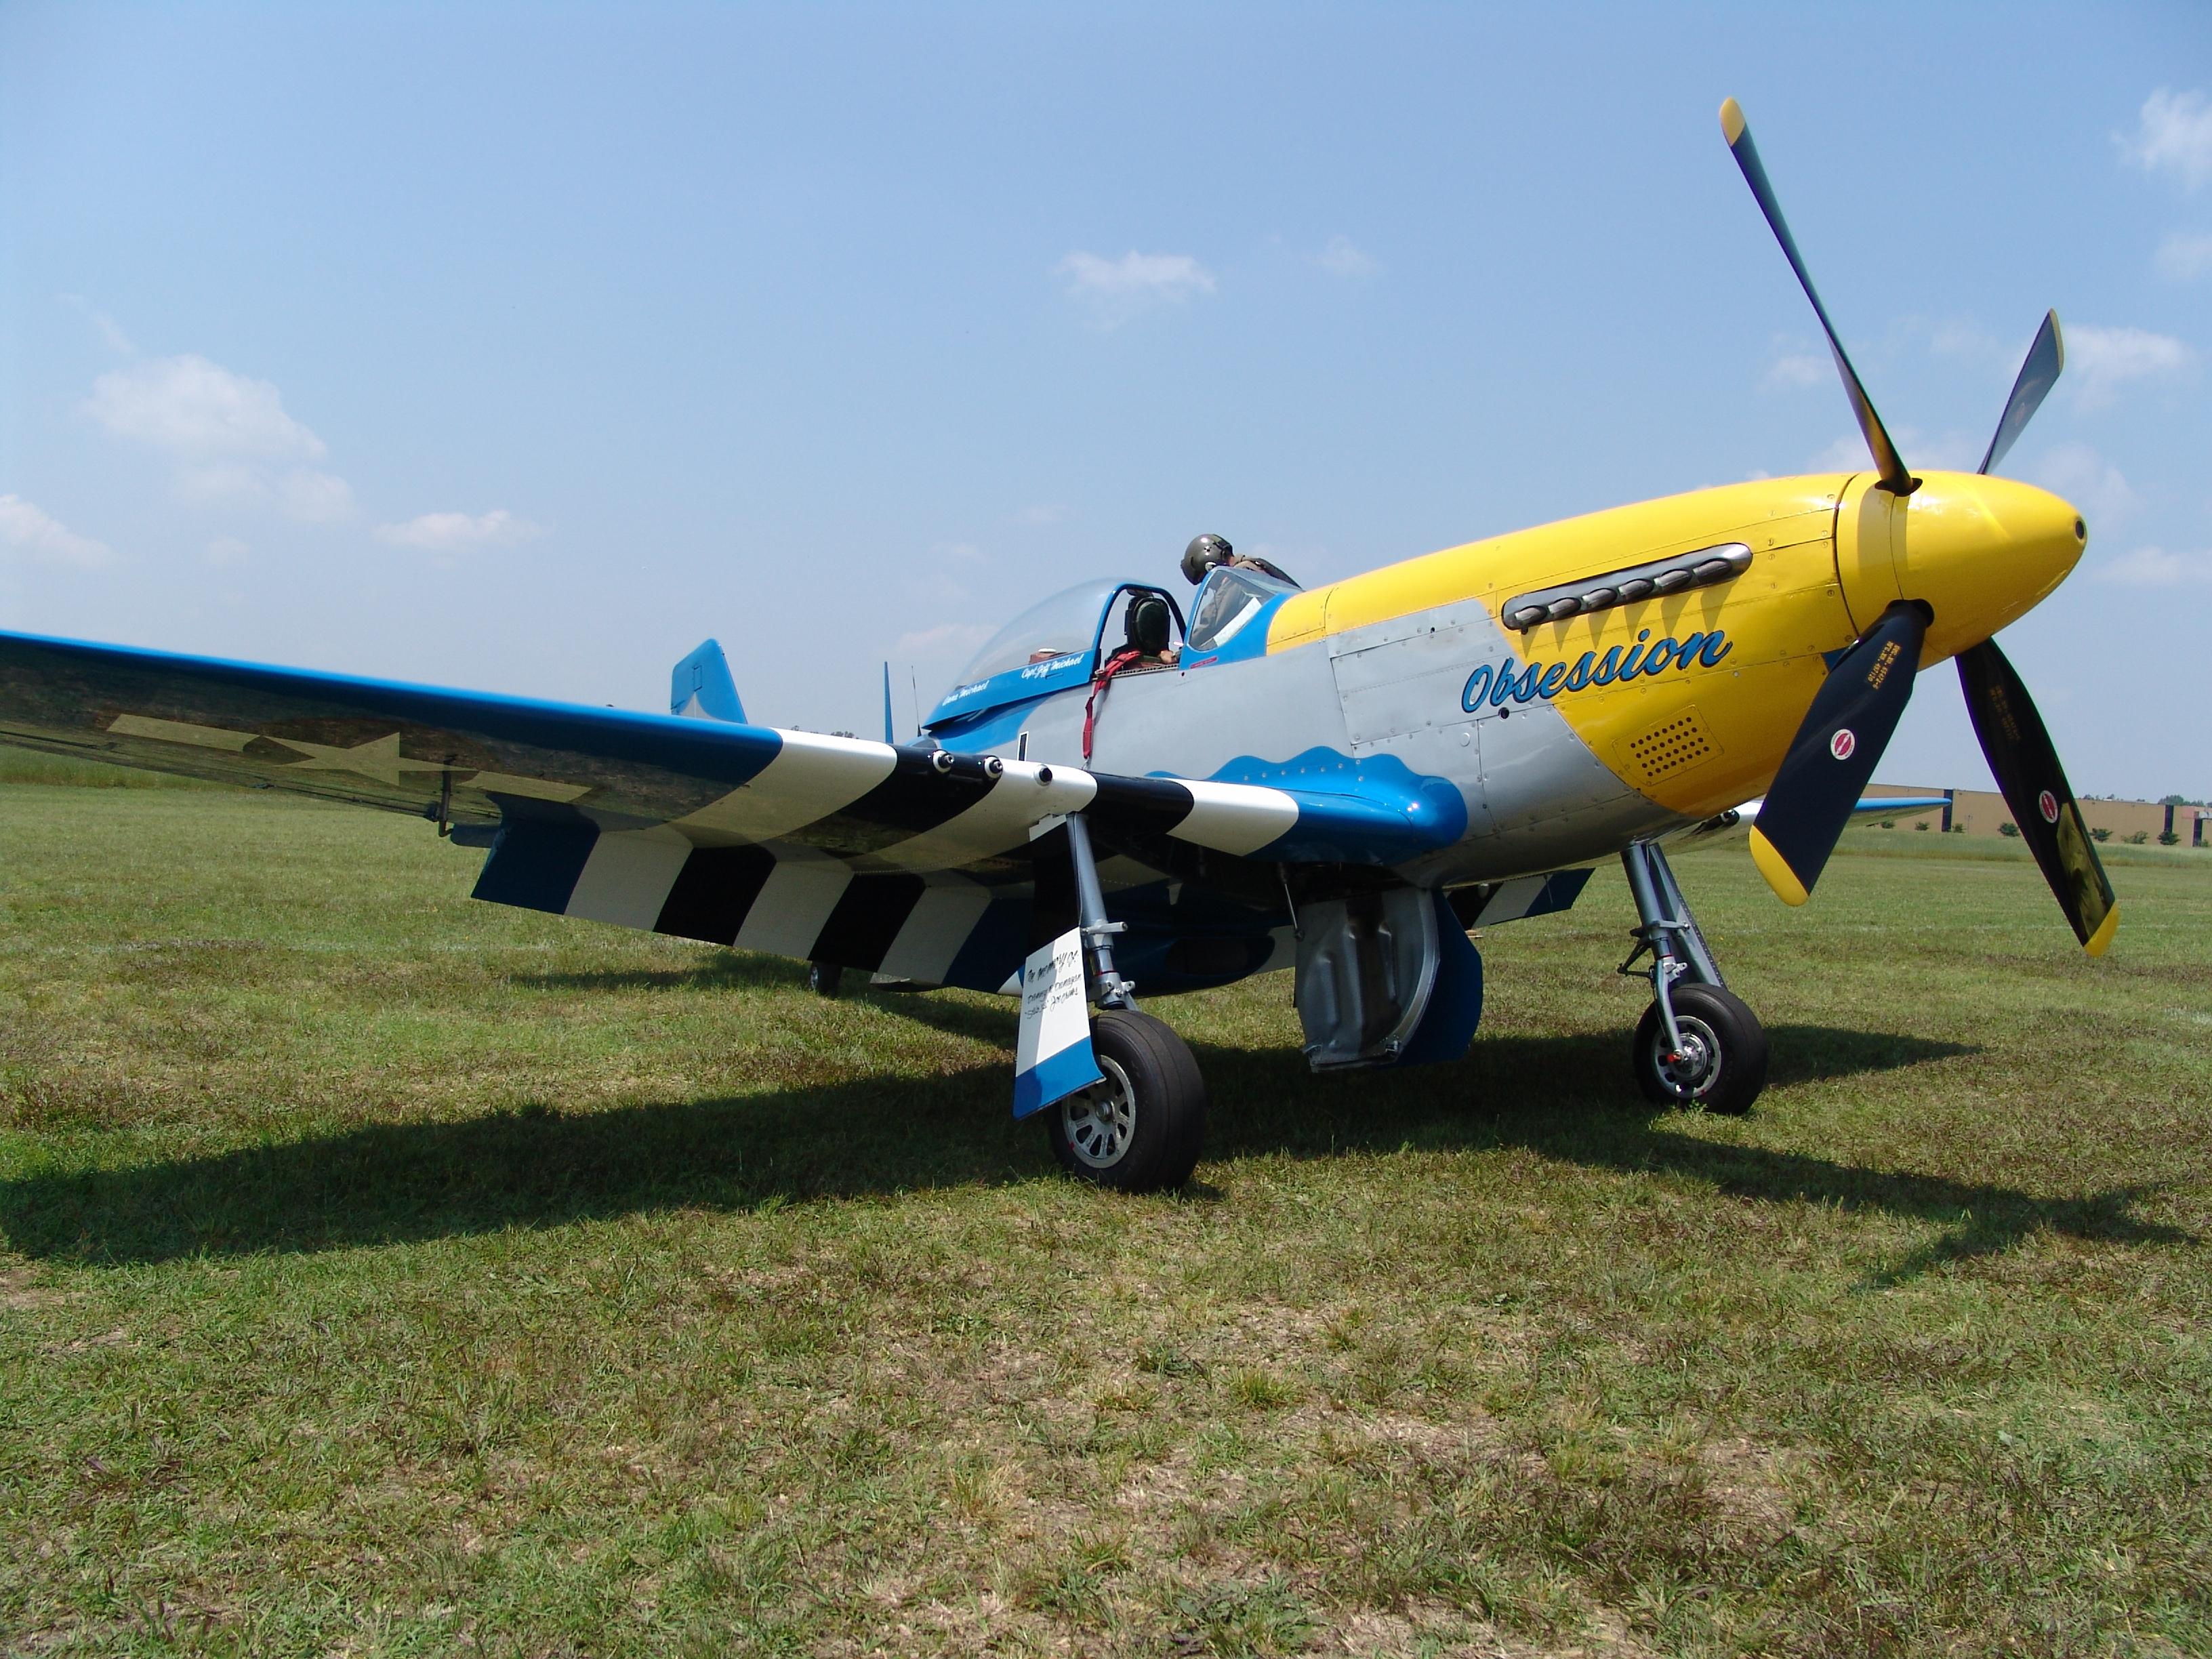 P-51_Mustang_01.jpg